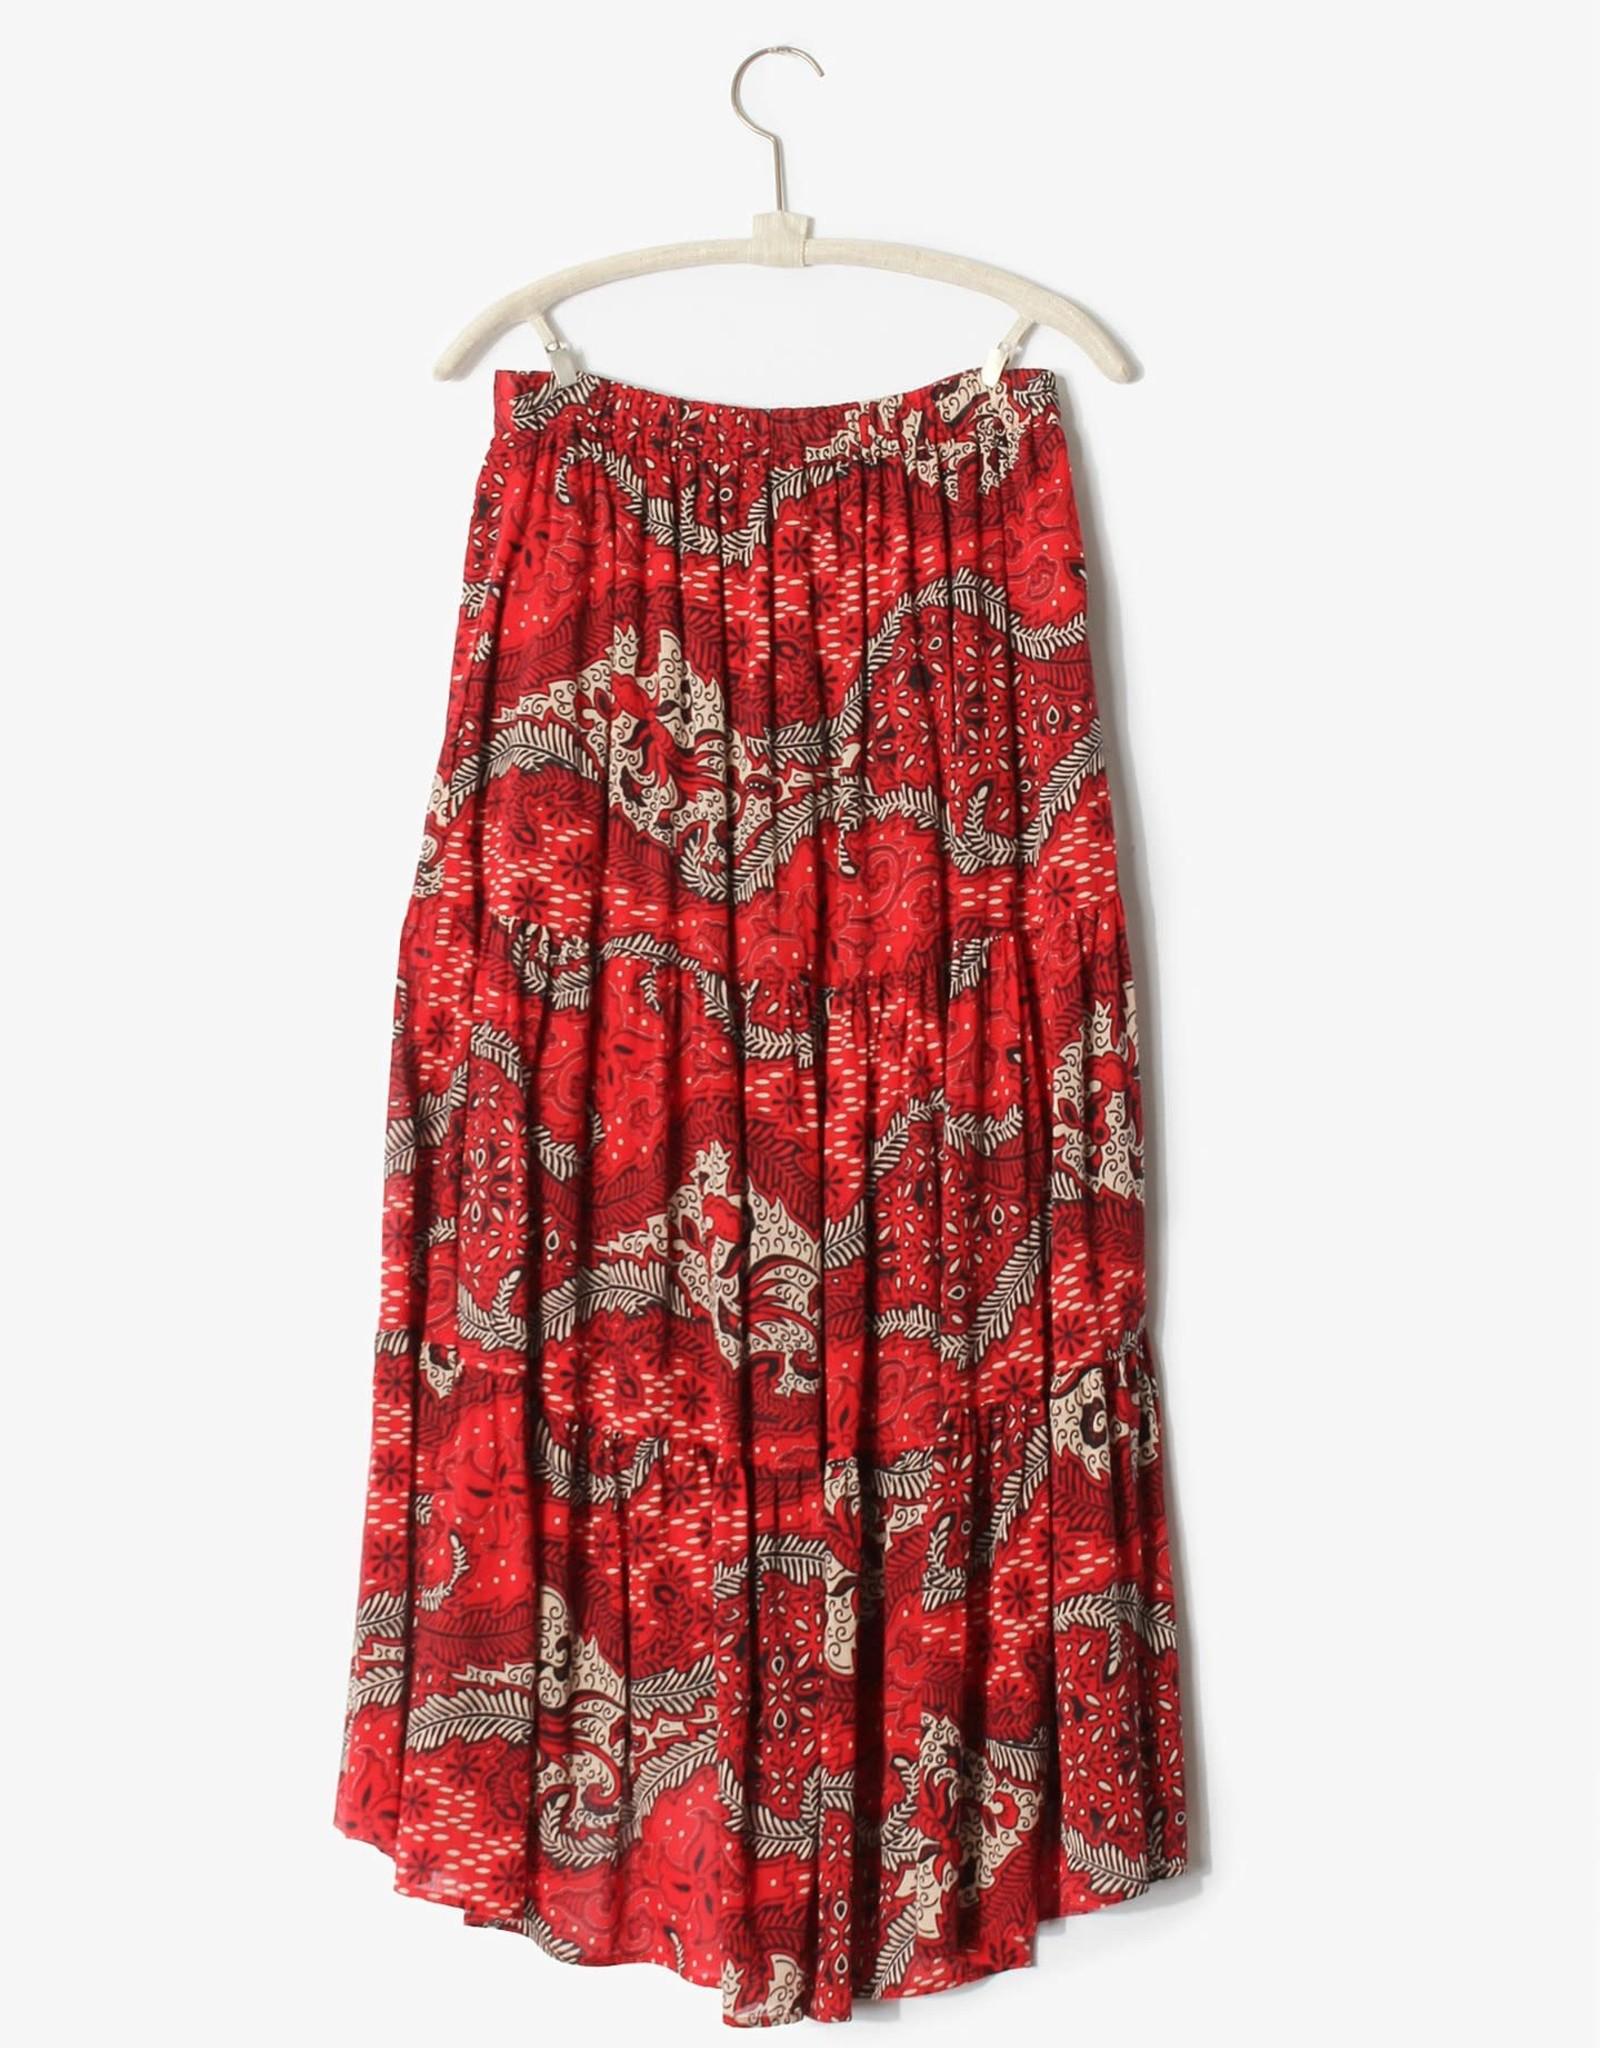 Xirena Xirena Iris Skirt Fire